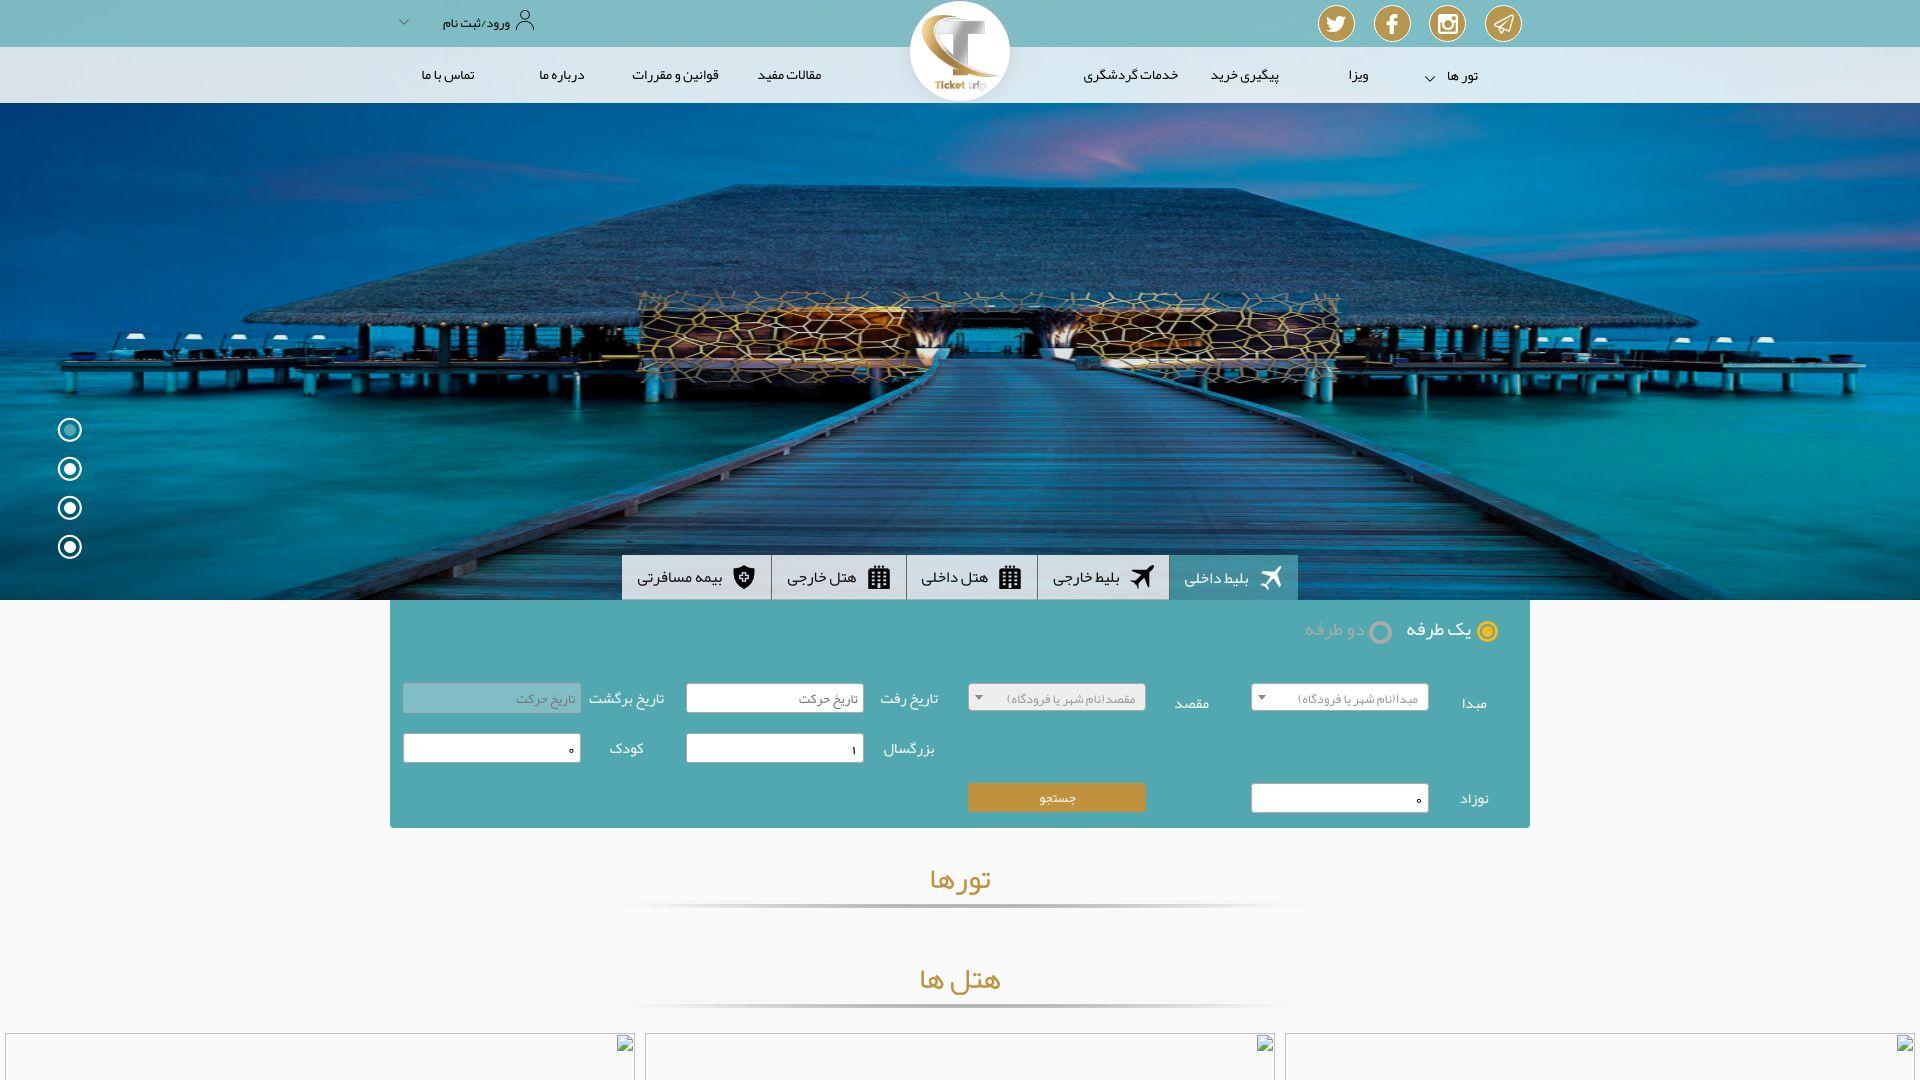 طراحی سیستم - طراحی سایت آژانس مسافرتی یکتا آرین کیش